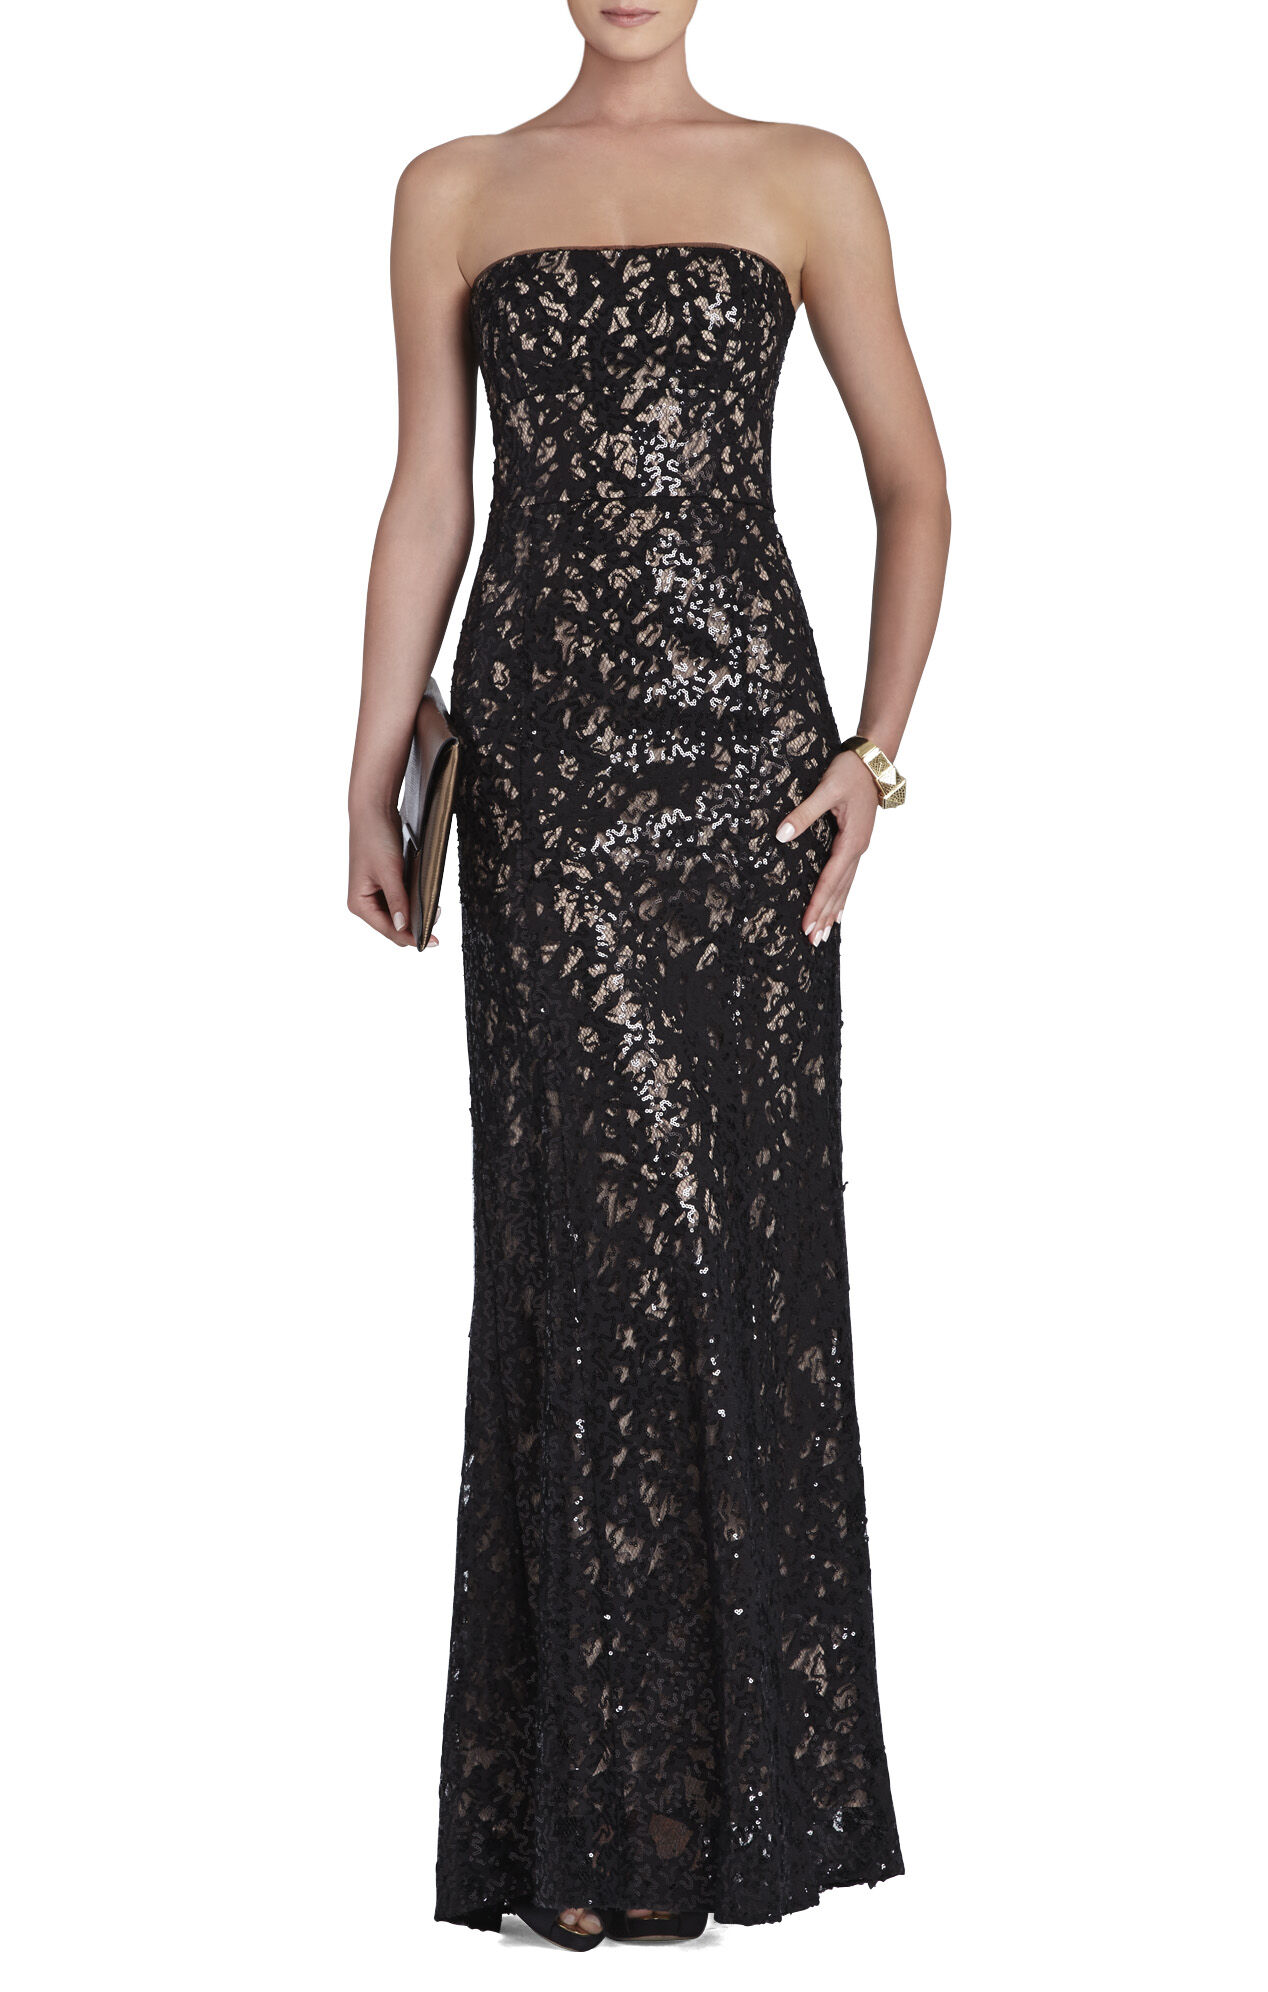 Natasha Applique Chiffon Sequined Cutout Dress